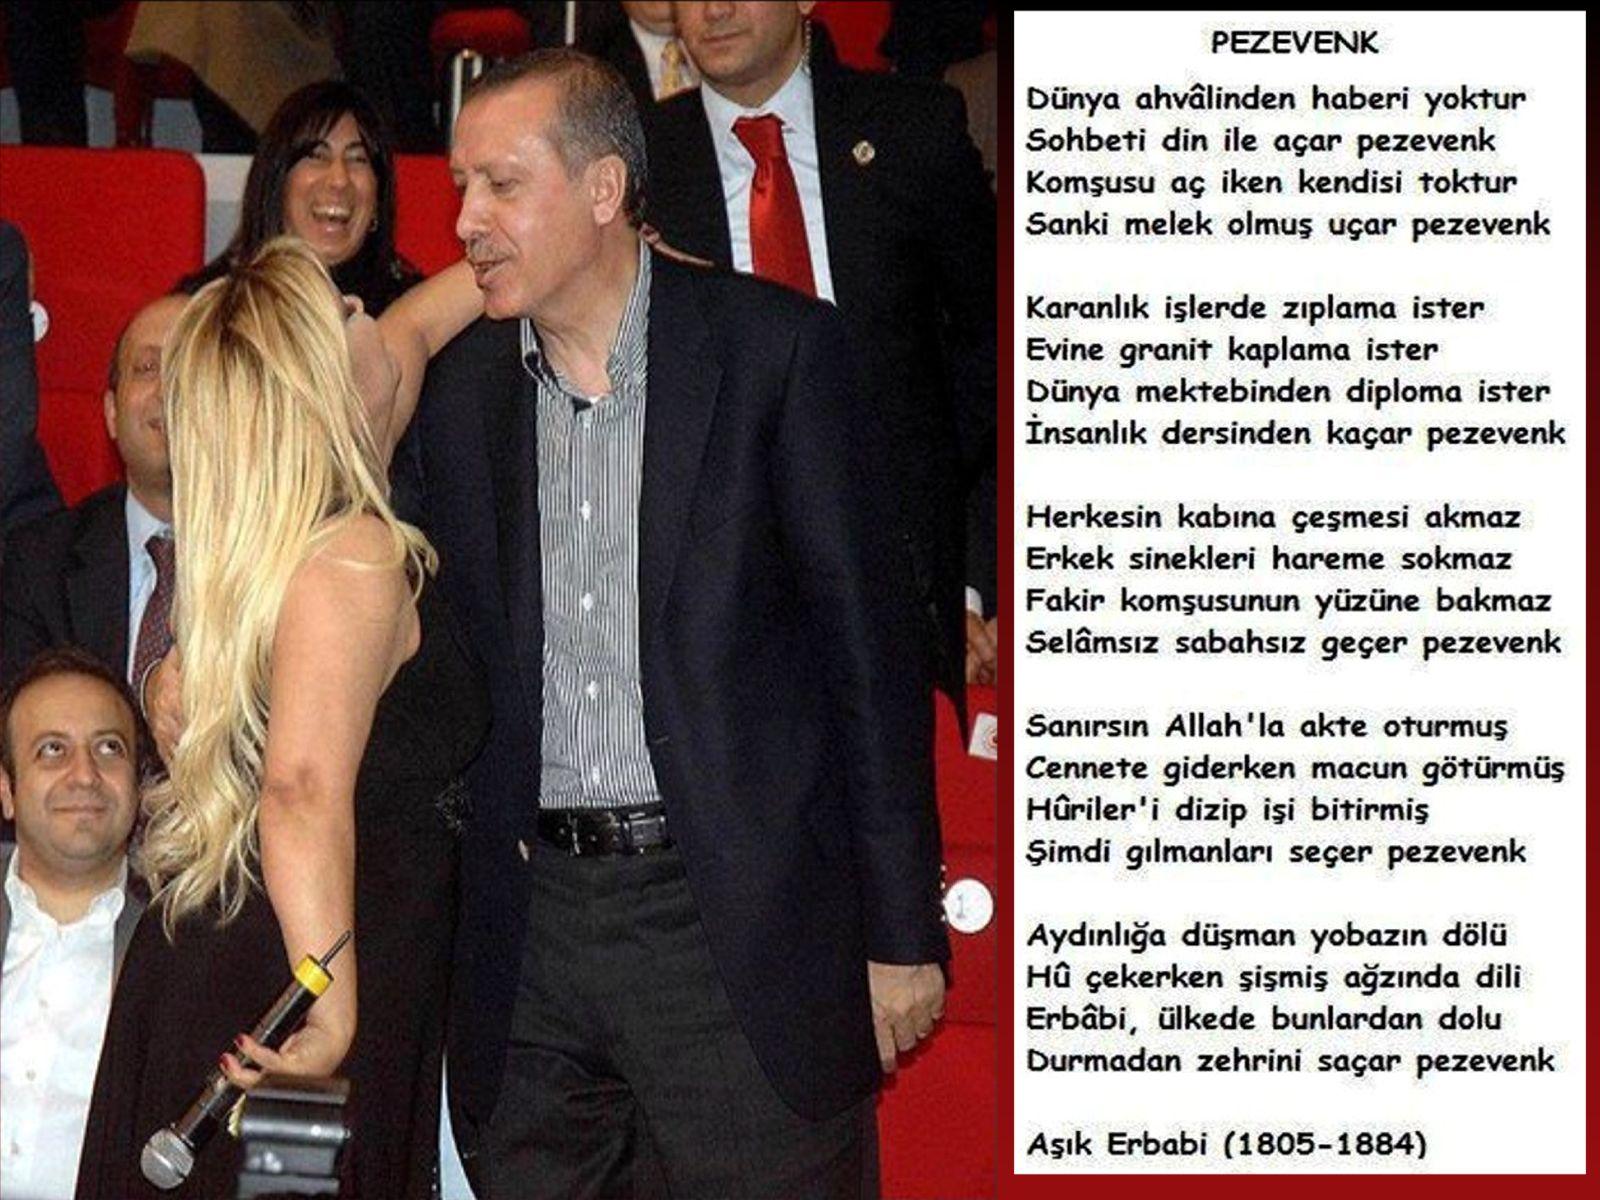 Devrimci Aleviler Birliği DAB Alevi Kızılbaş Bektaşi pir sultan cem hz Ali 12 imam semah Feramuz Şah Acar pezevenk